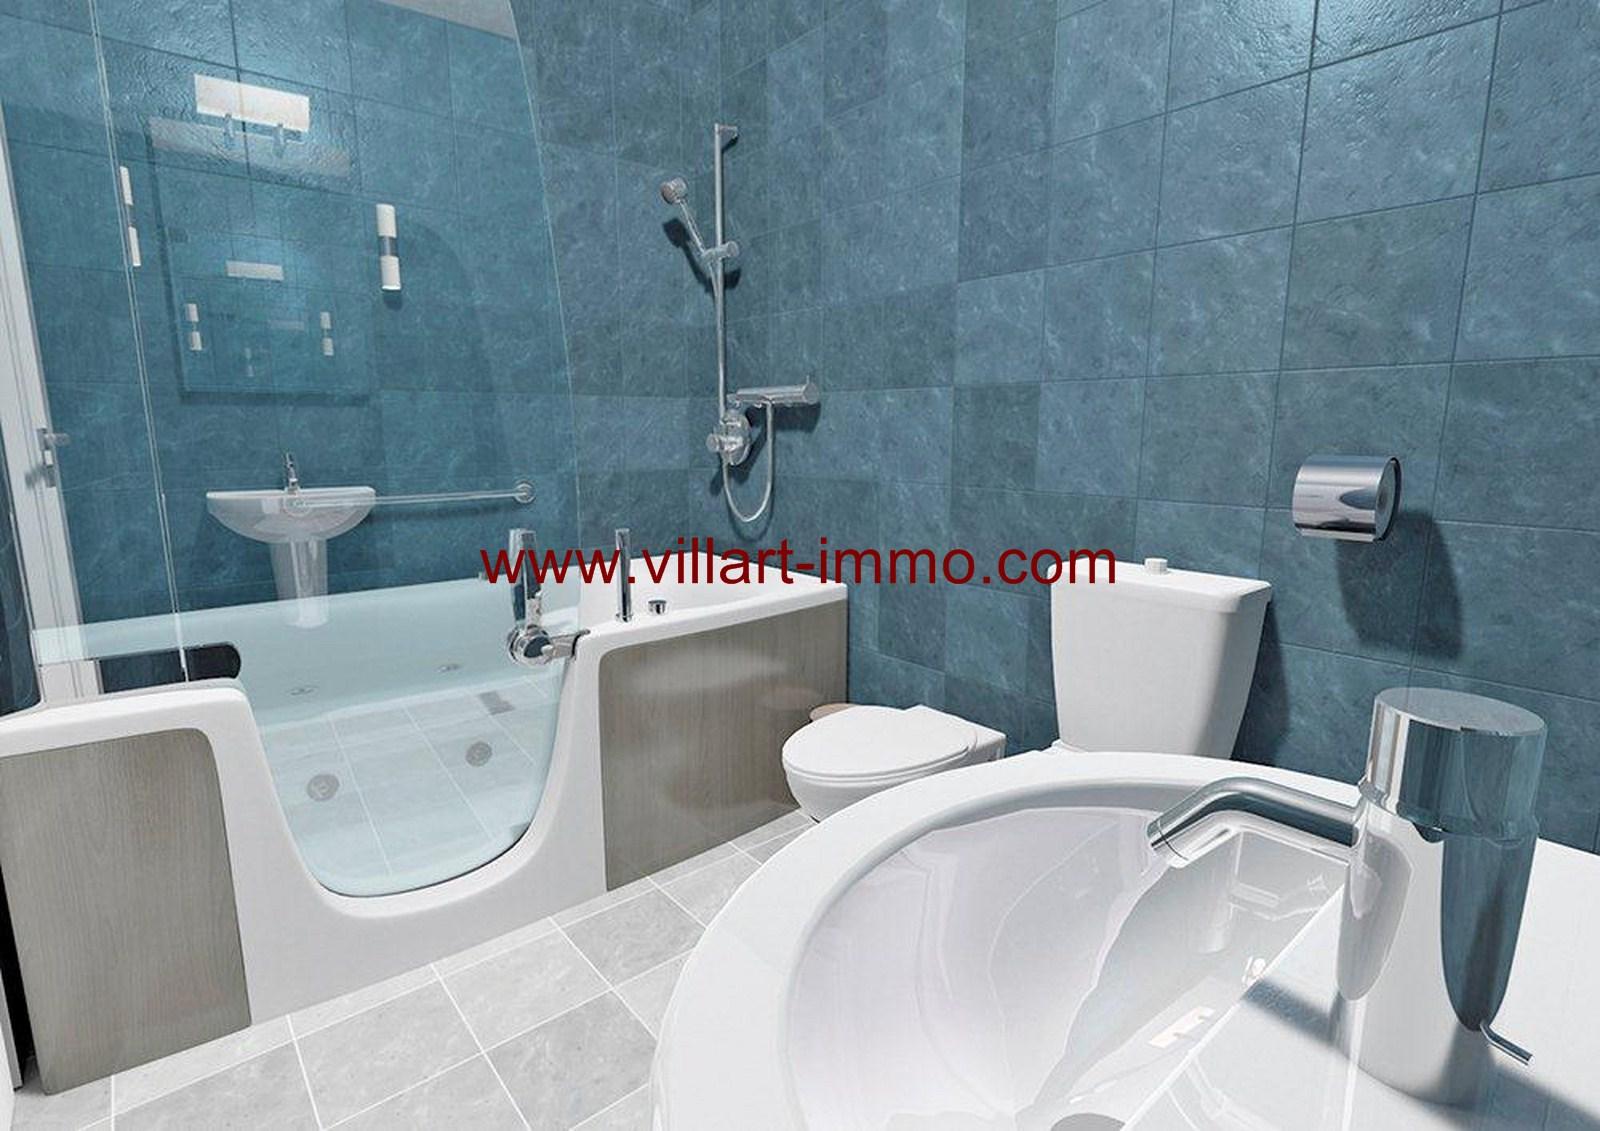 4-Vente-Appartement-Tanger-Centre-ville-SHAZ-Villart Immo